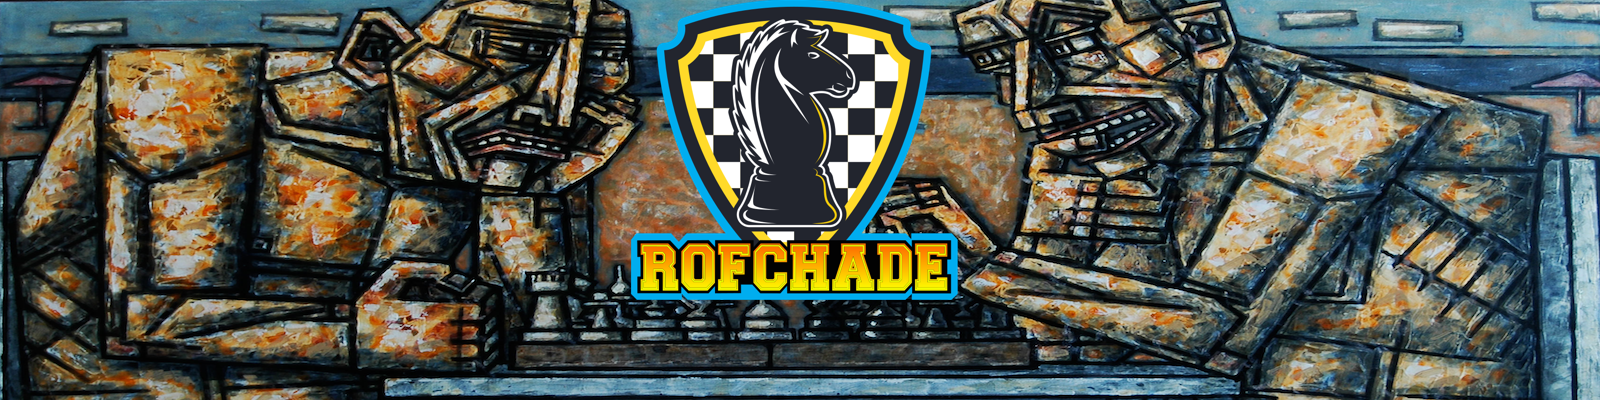 ROFCHADE – a UCI Chess Engine